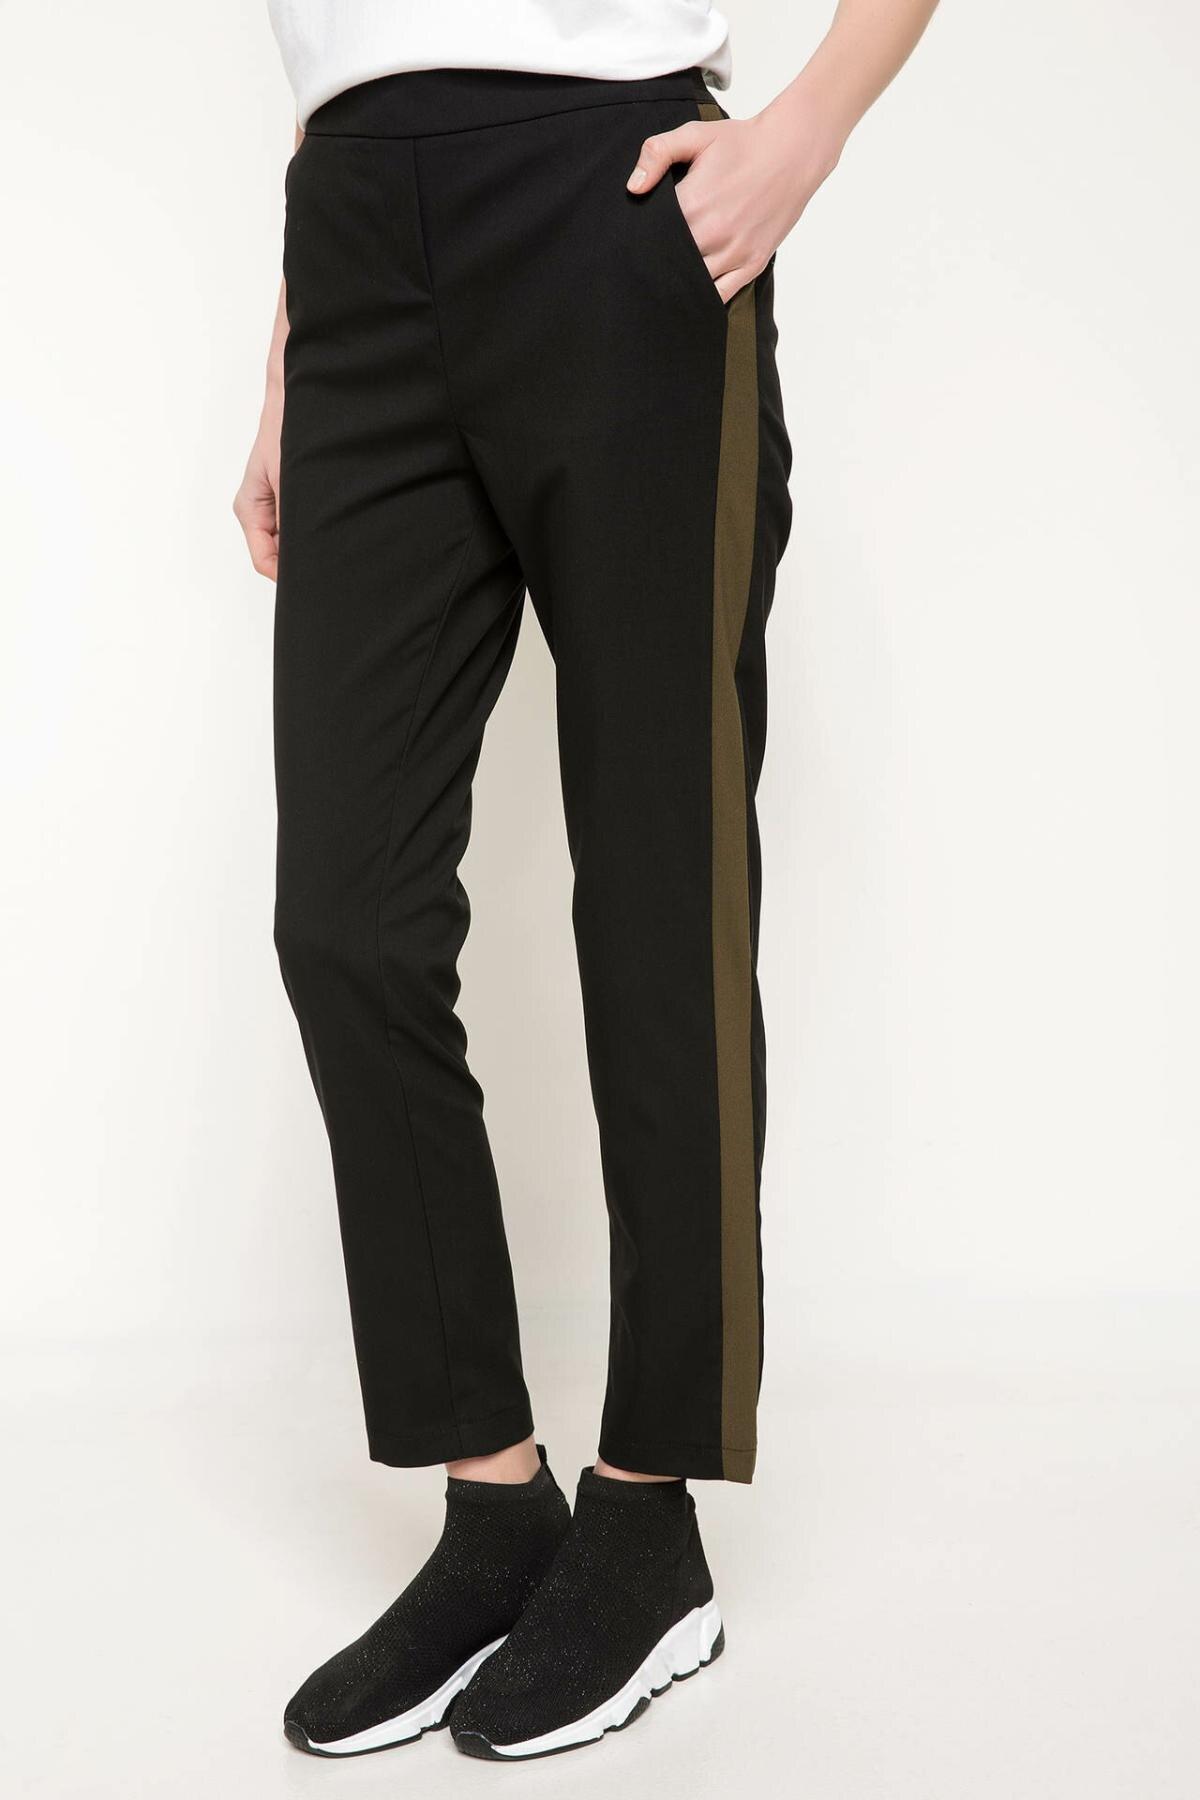 DeFacto New Female Fashion Trousers Ladies Casual Long Pants Comfort Straight Black Comfort Loose Pants - I7292AZ18SP